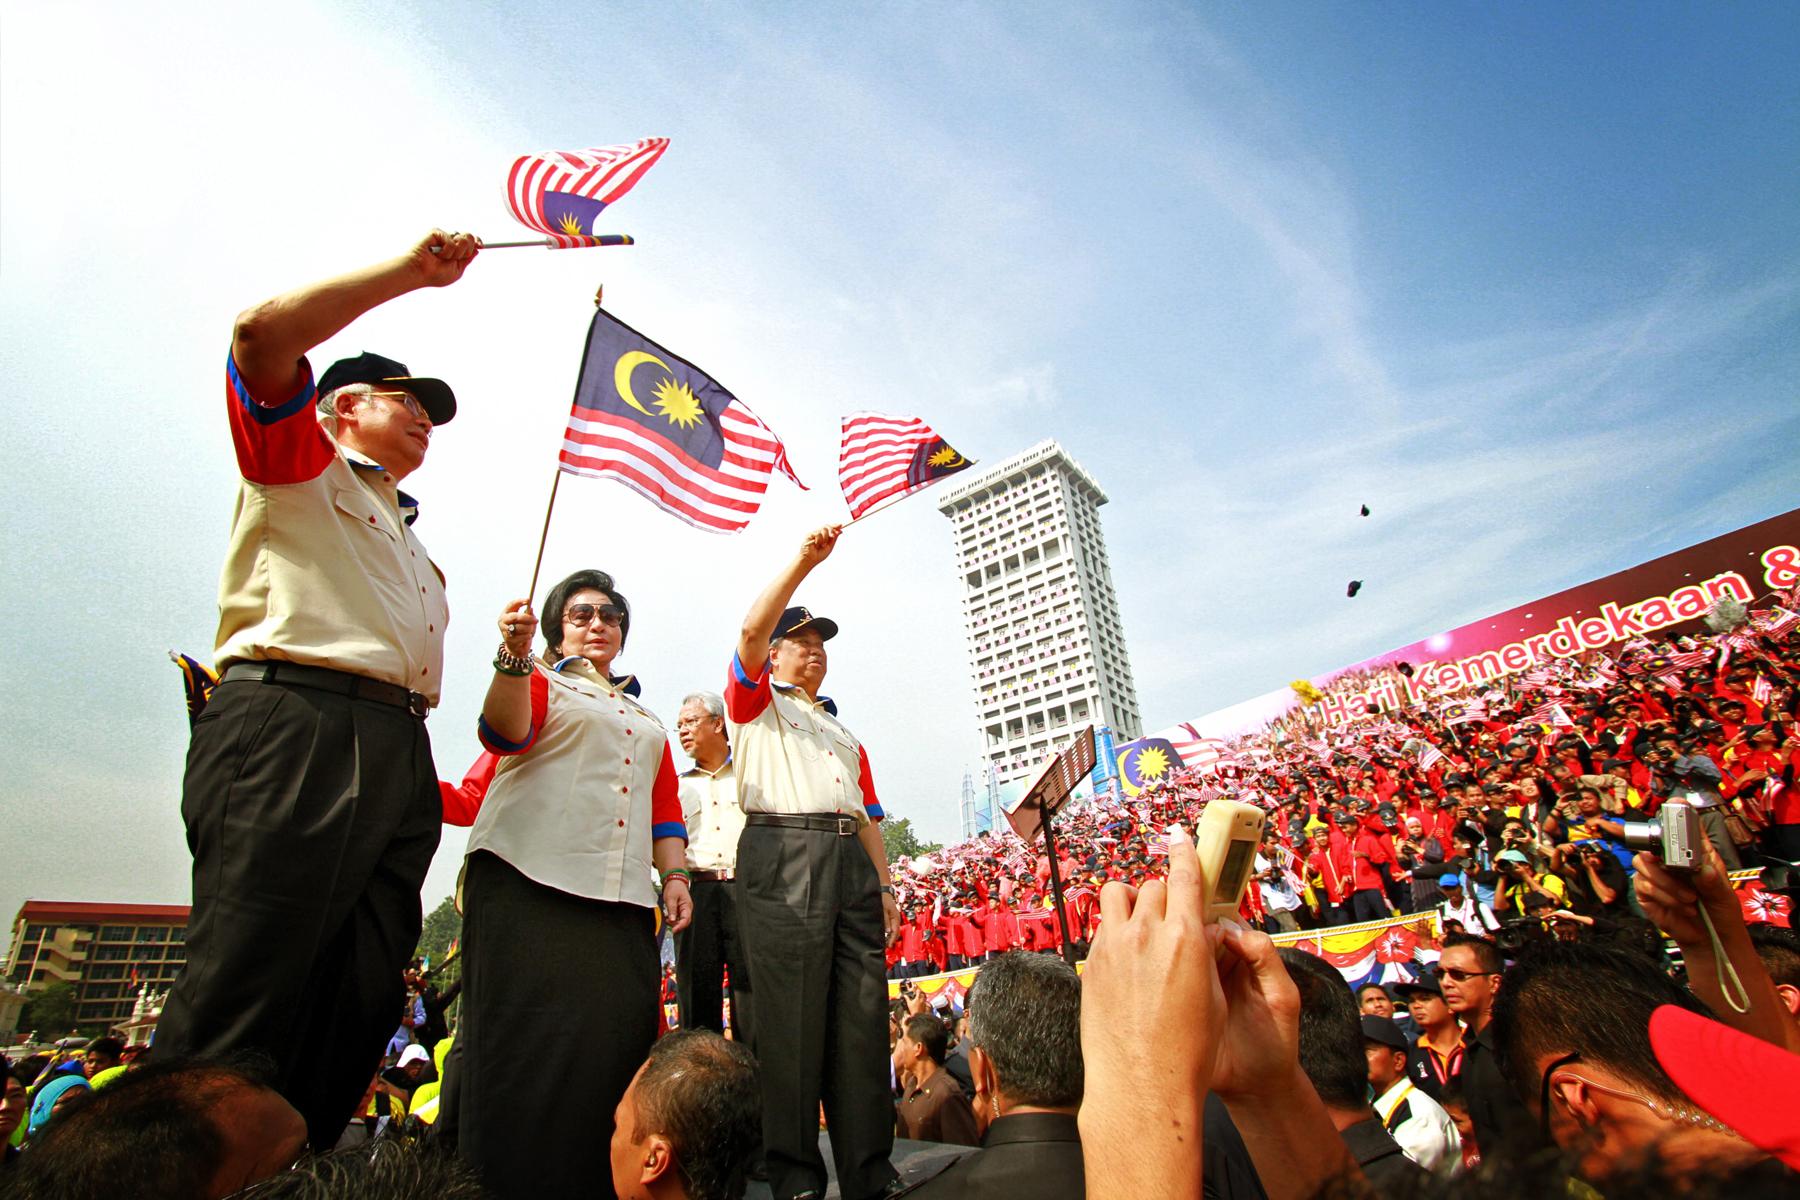 Malaysia Day - Wikipedia